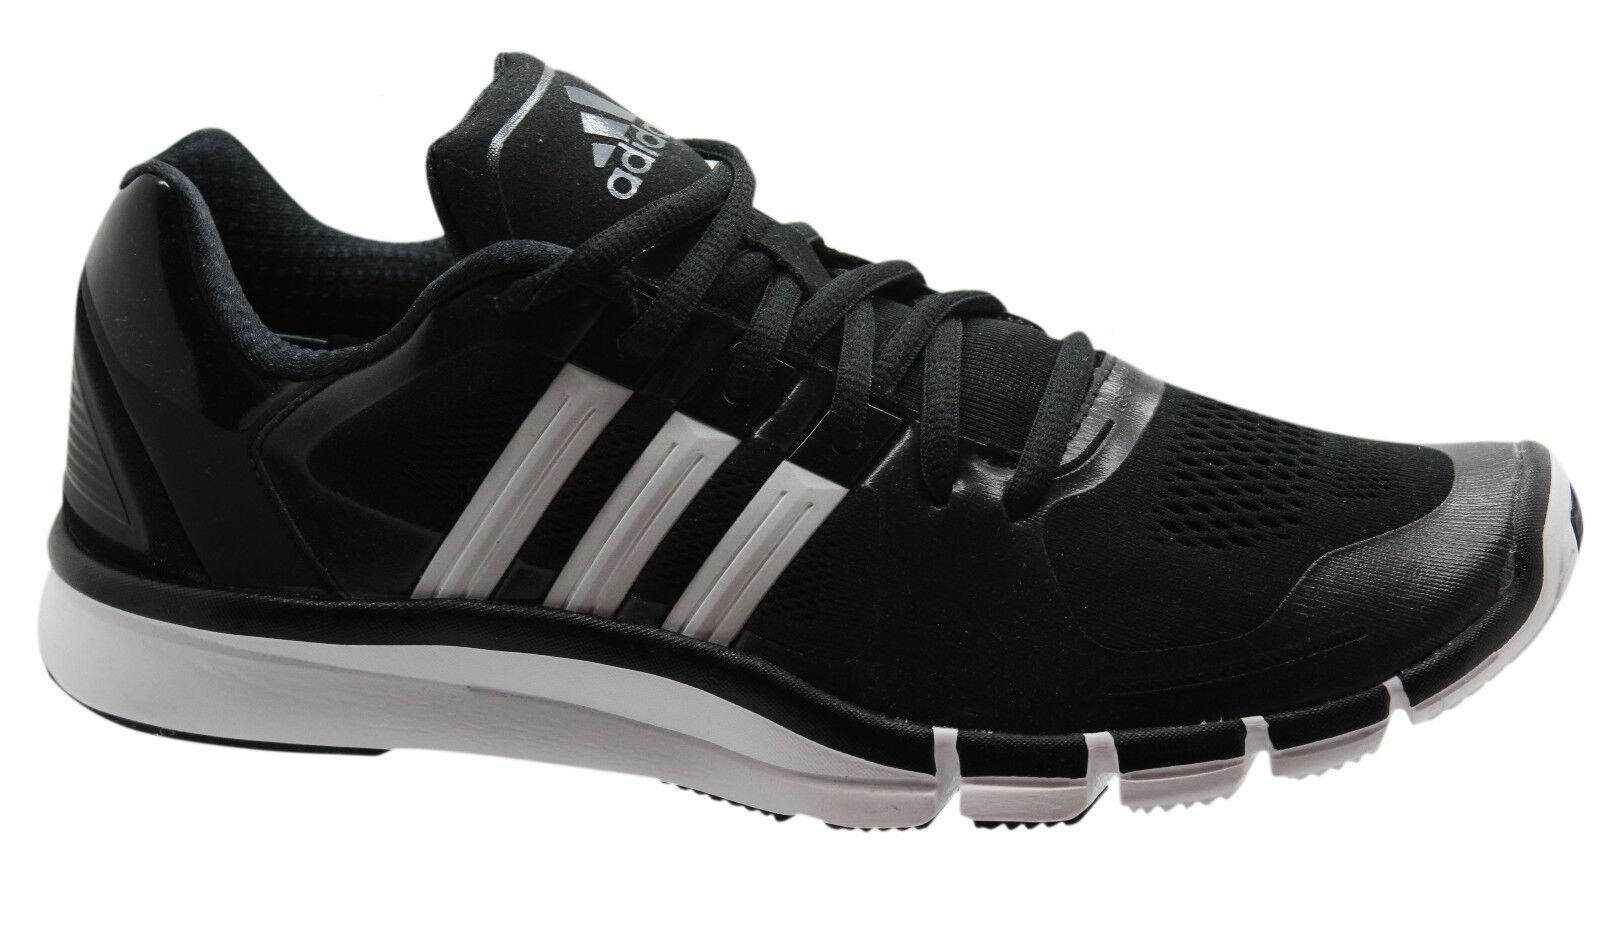 Adidas Prestazioni Sportive Adipure 360.2 Scarpe Uomo da Corsa B40935 U96